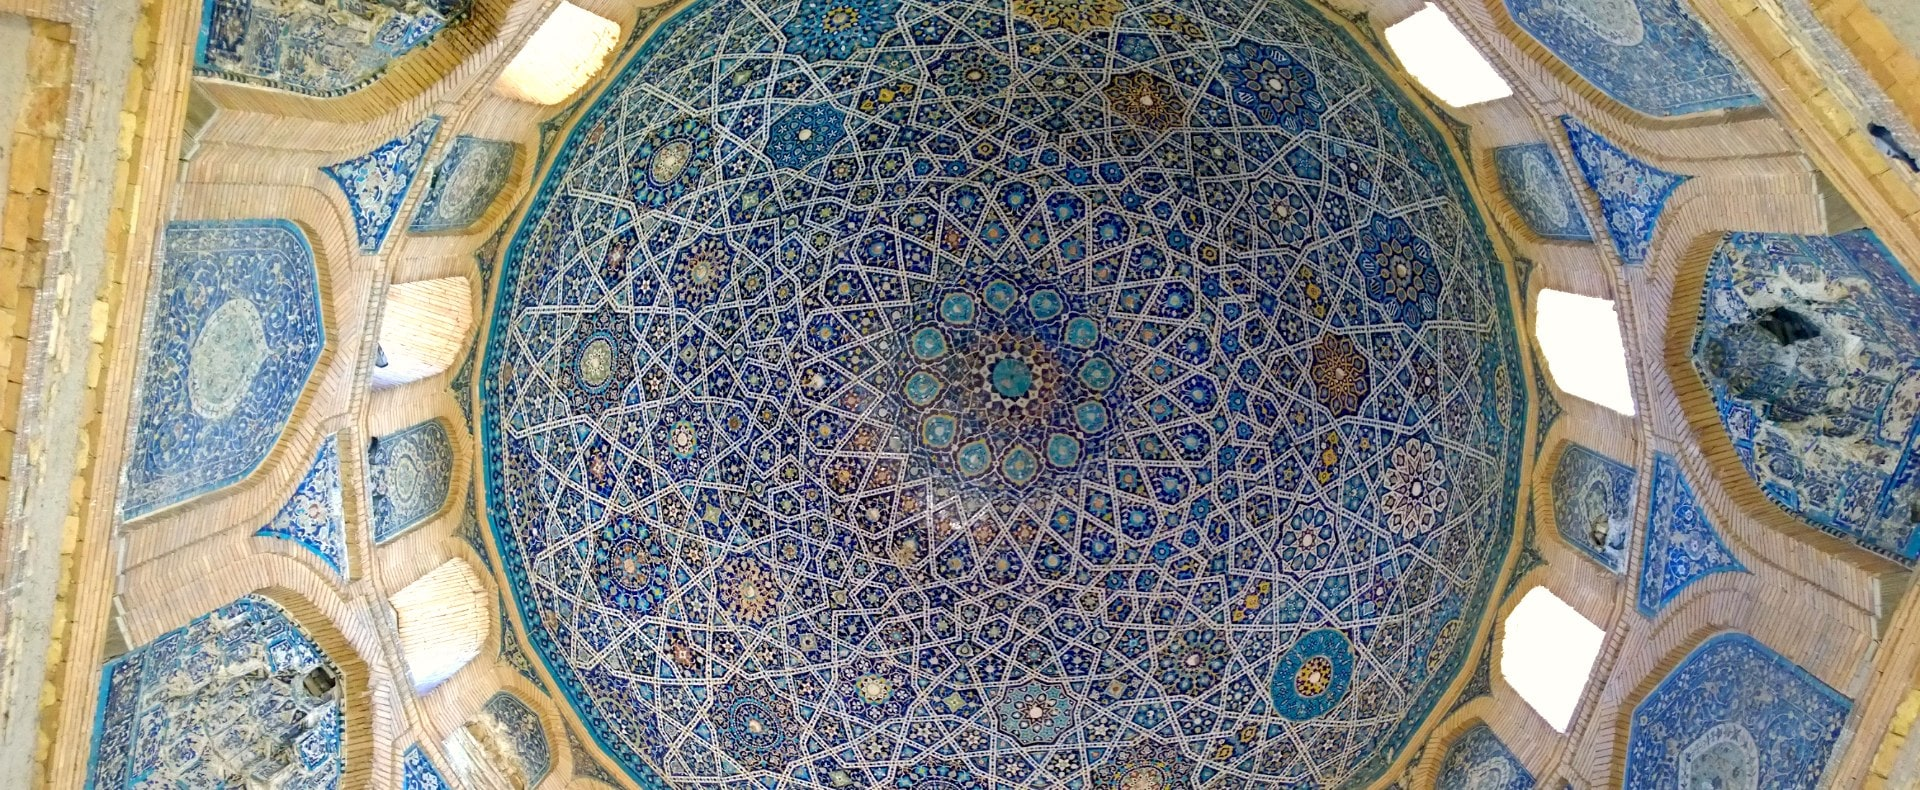 Ashgabat, Turkmenistan Gallery